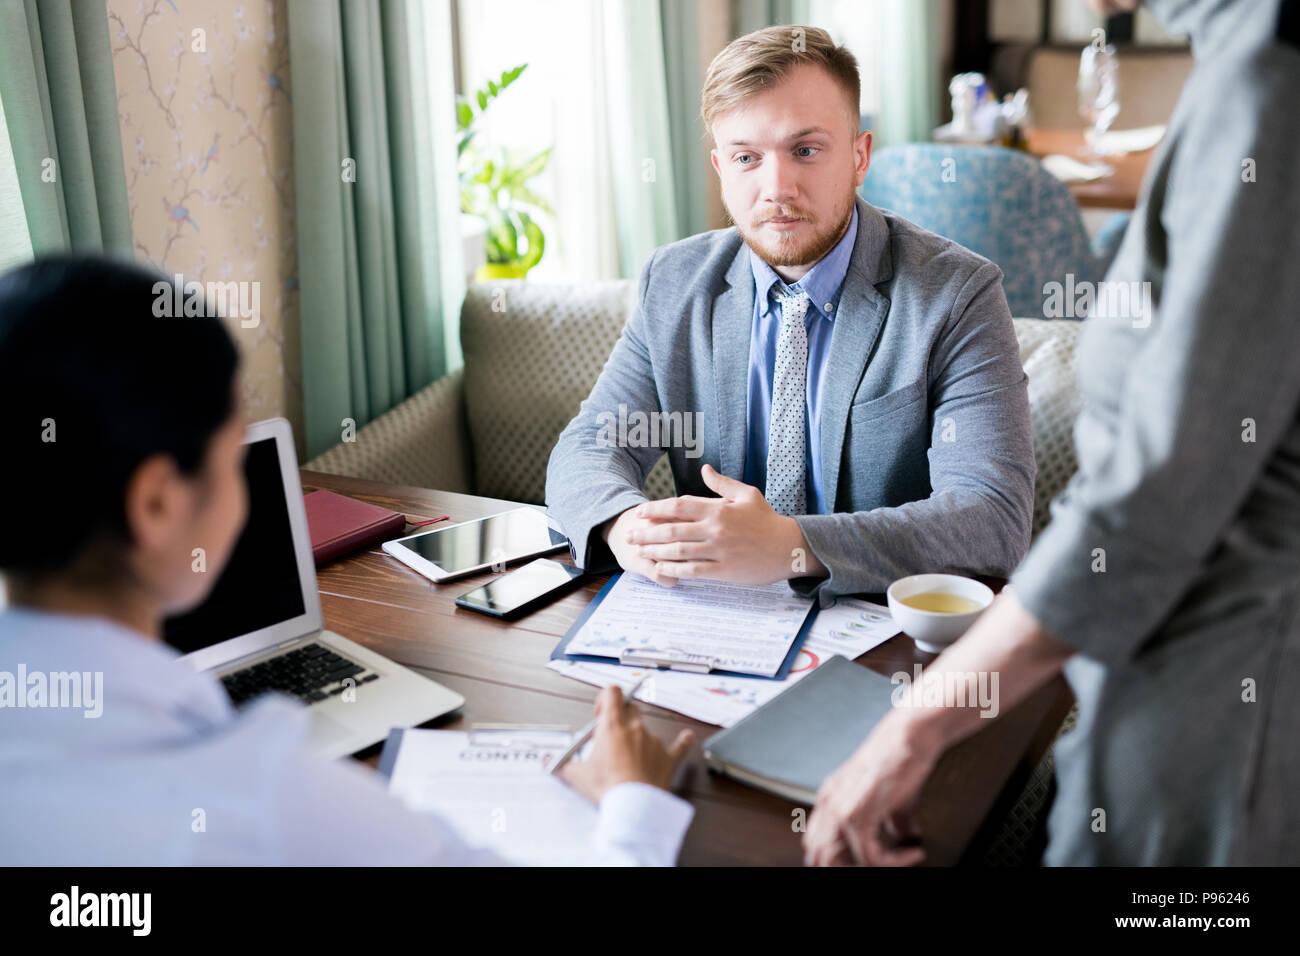 Businessman at meeting - Stock Image